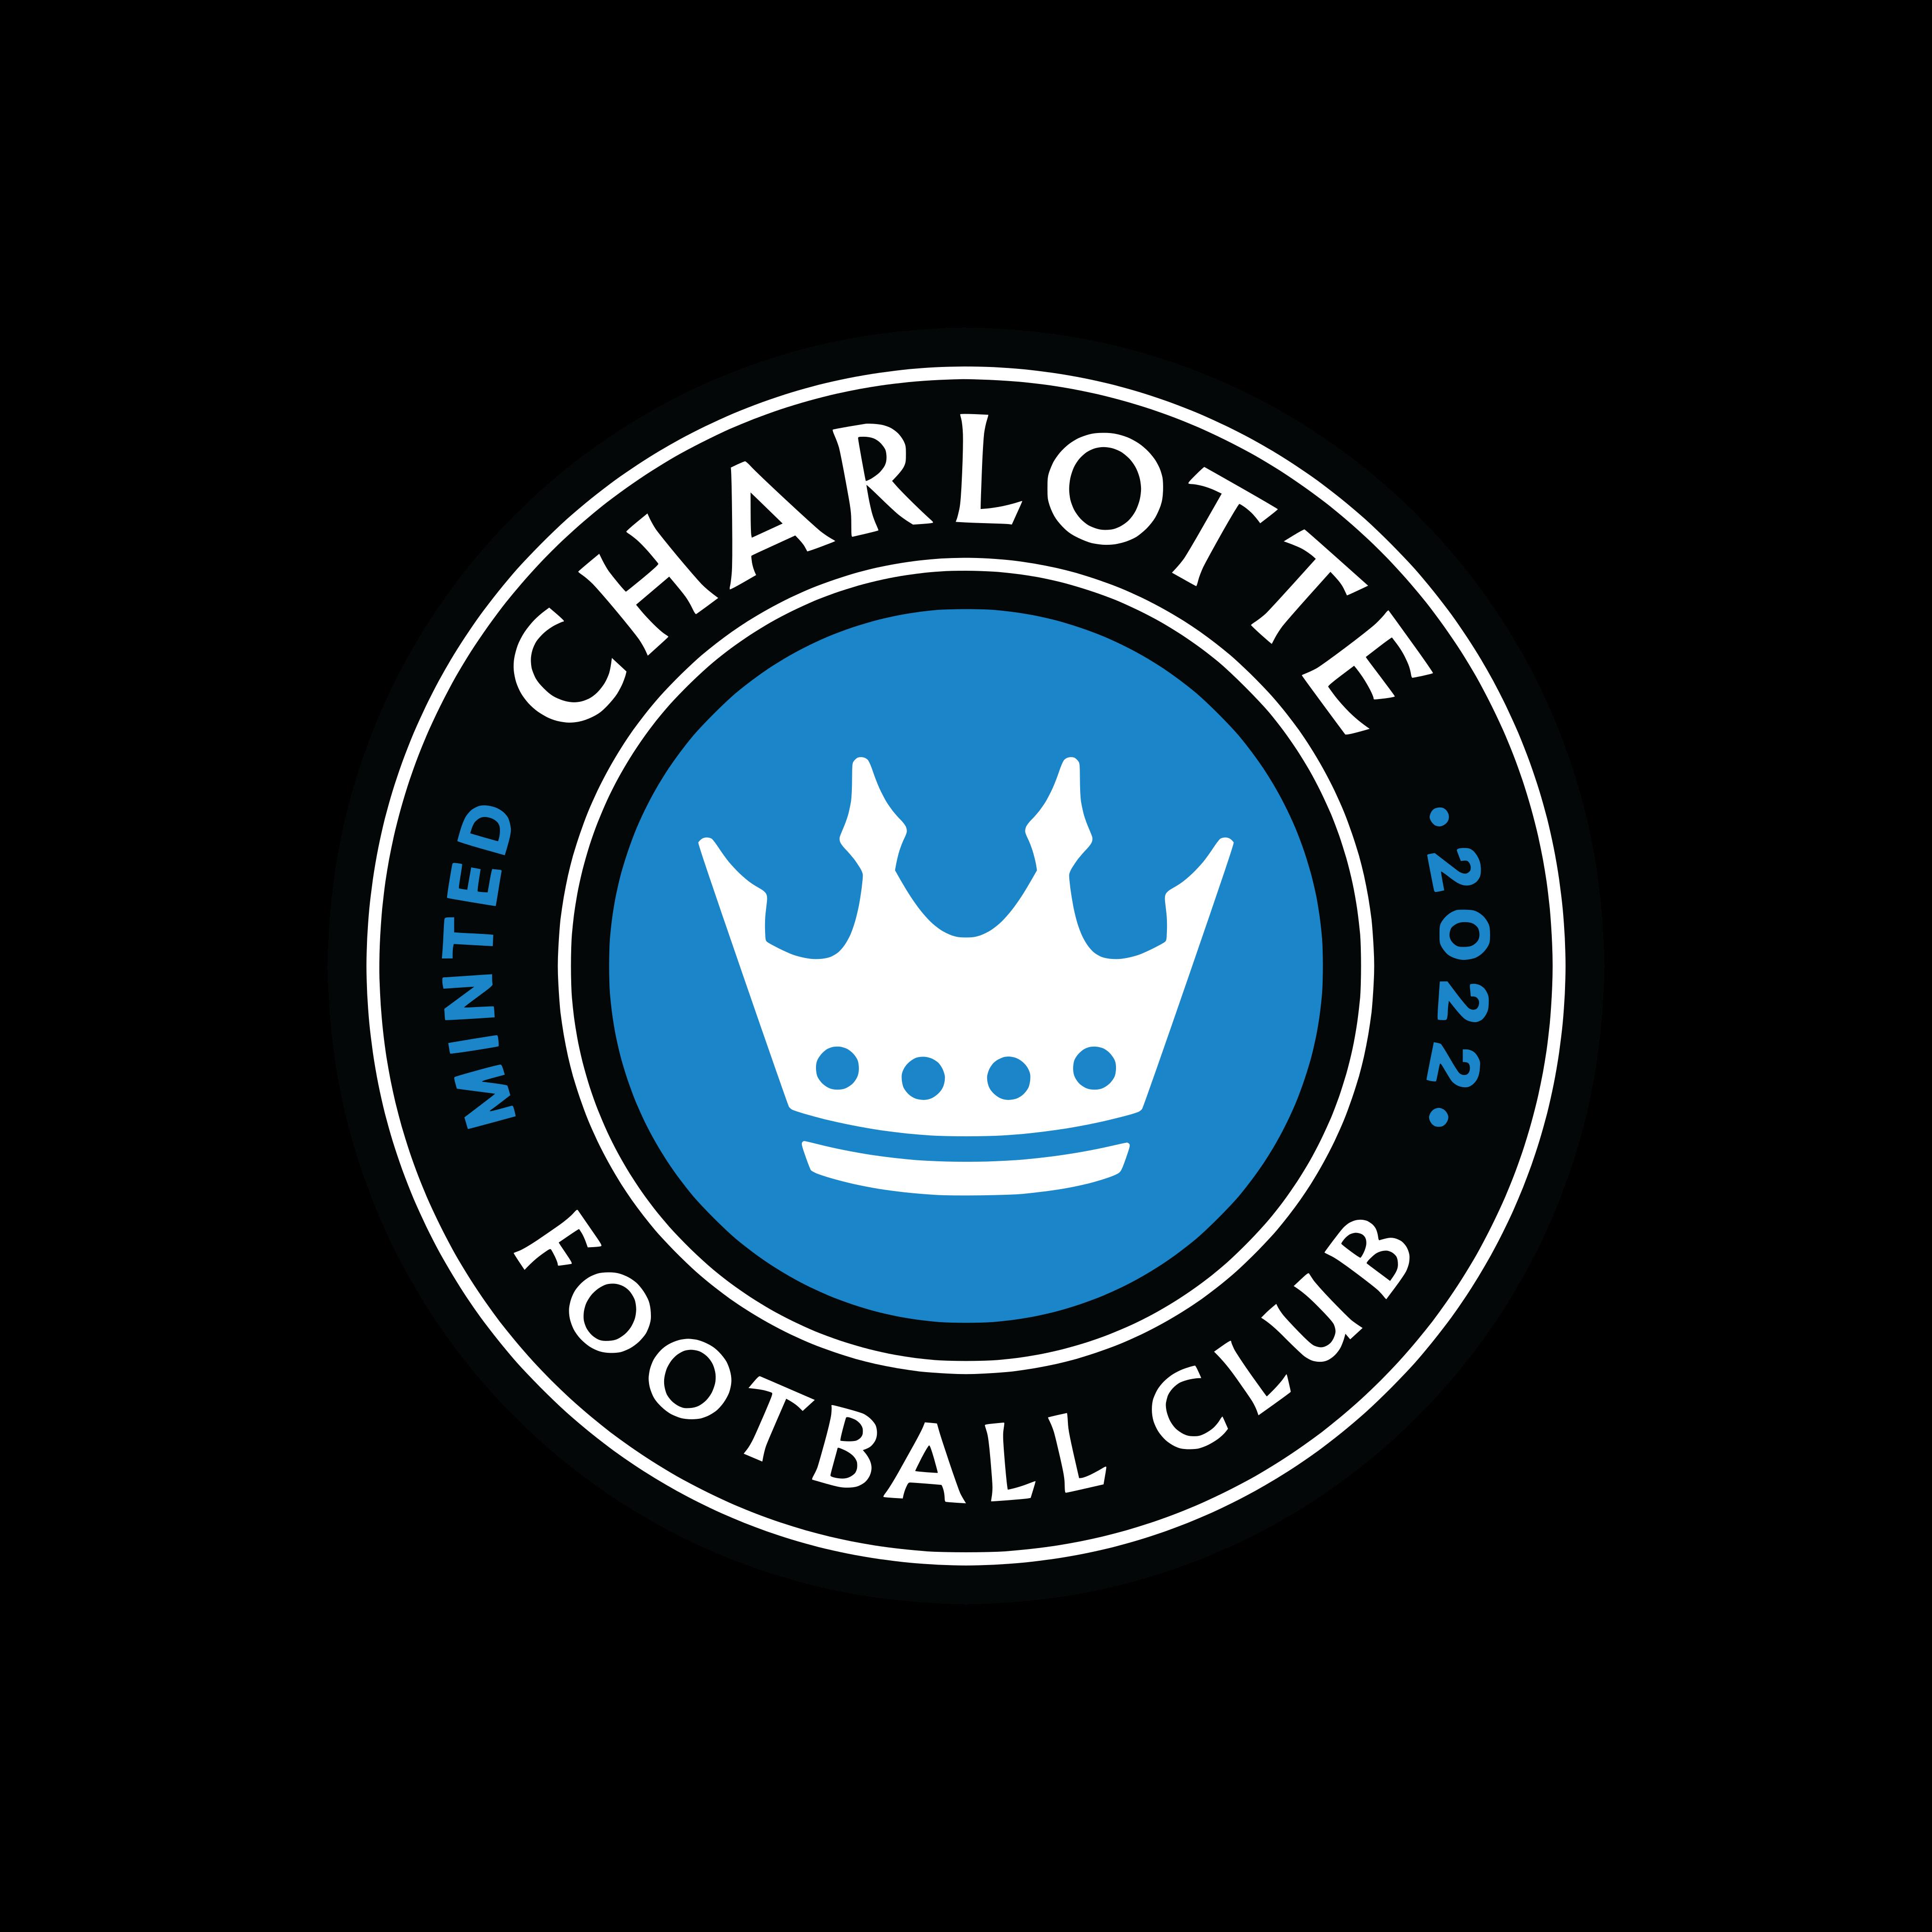 charlotte logo 0 - Charlote FC Logo